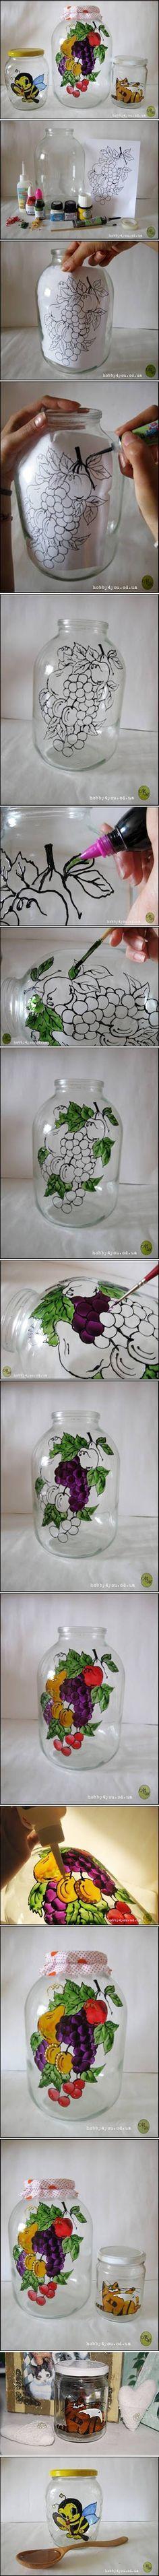 DIY Jar Art - craft ideas - easy decorations http://m.lovethispic.com/image/38675/diy-jar-art?utm_content=buffer0cd12&utm_medium=social&utm_source=pinterest.com&utm_campaign=buffer https://www.renoback.com/?utm_content=buffer55a34&utm_medium=social&utm_source=pinterest.com&utm_campaign=buffer